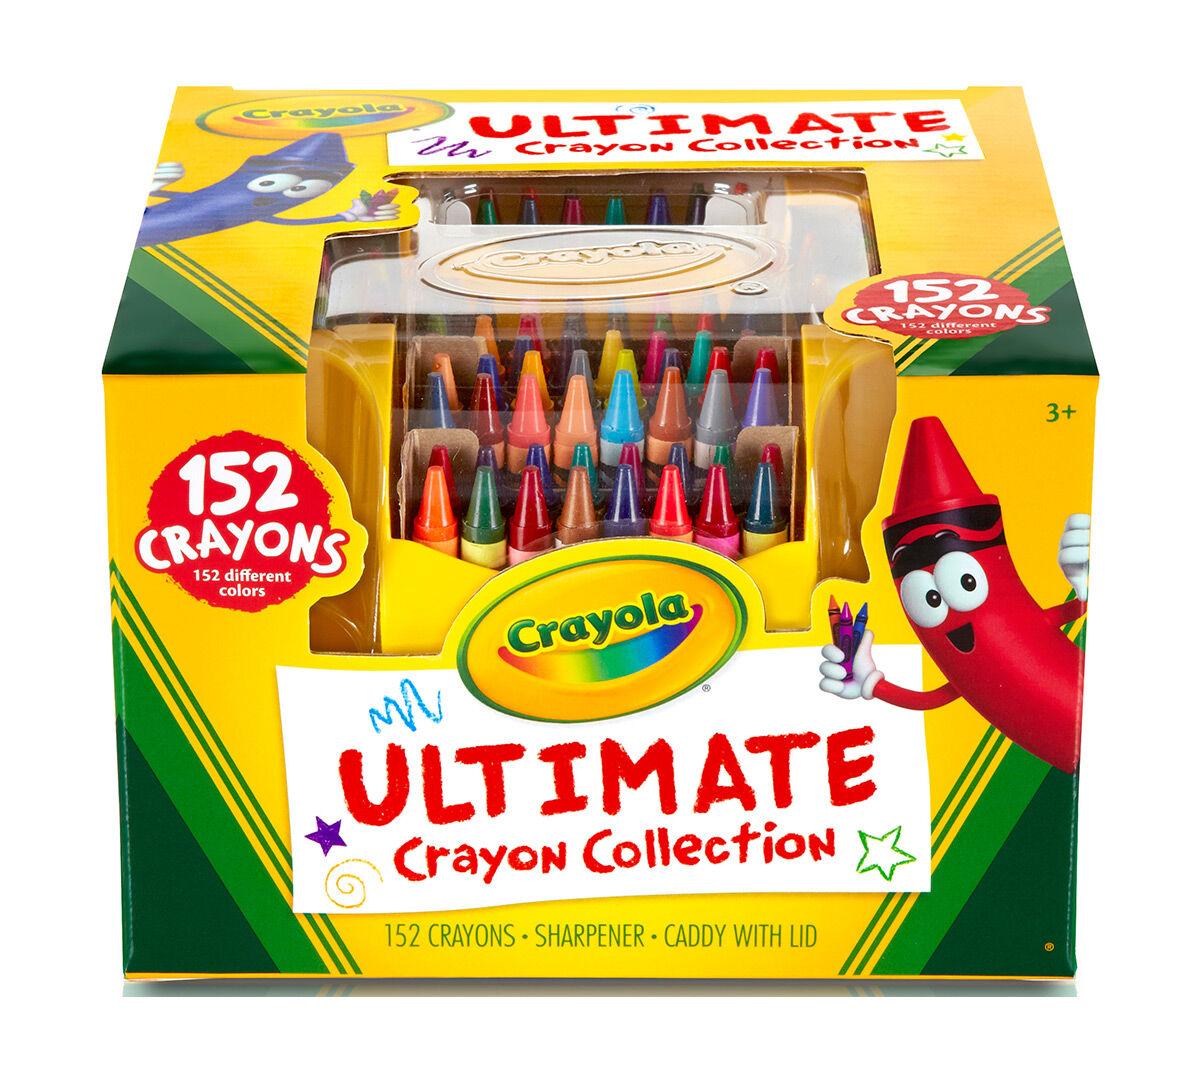 Ultimate Crayon Collection Crayola